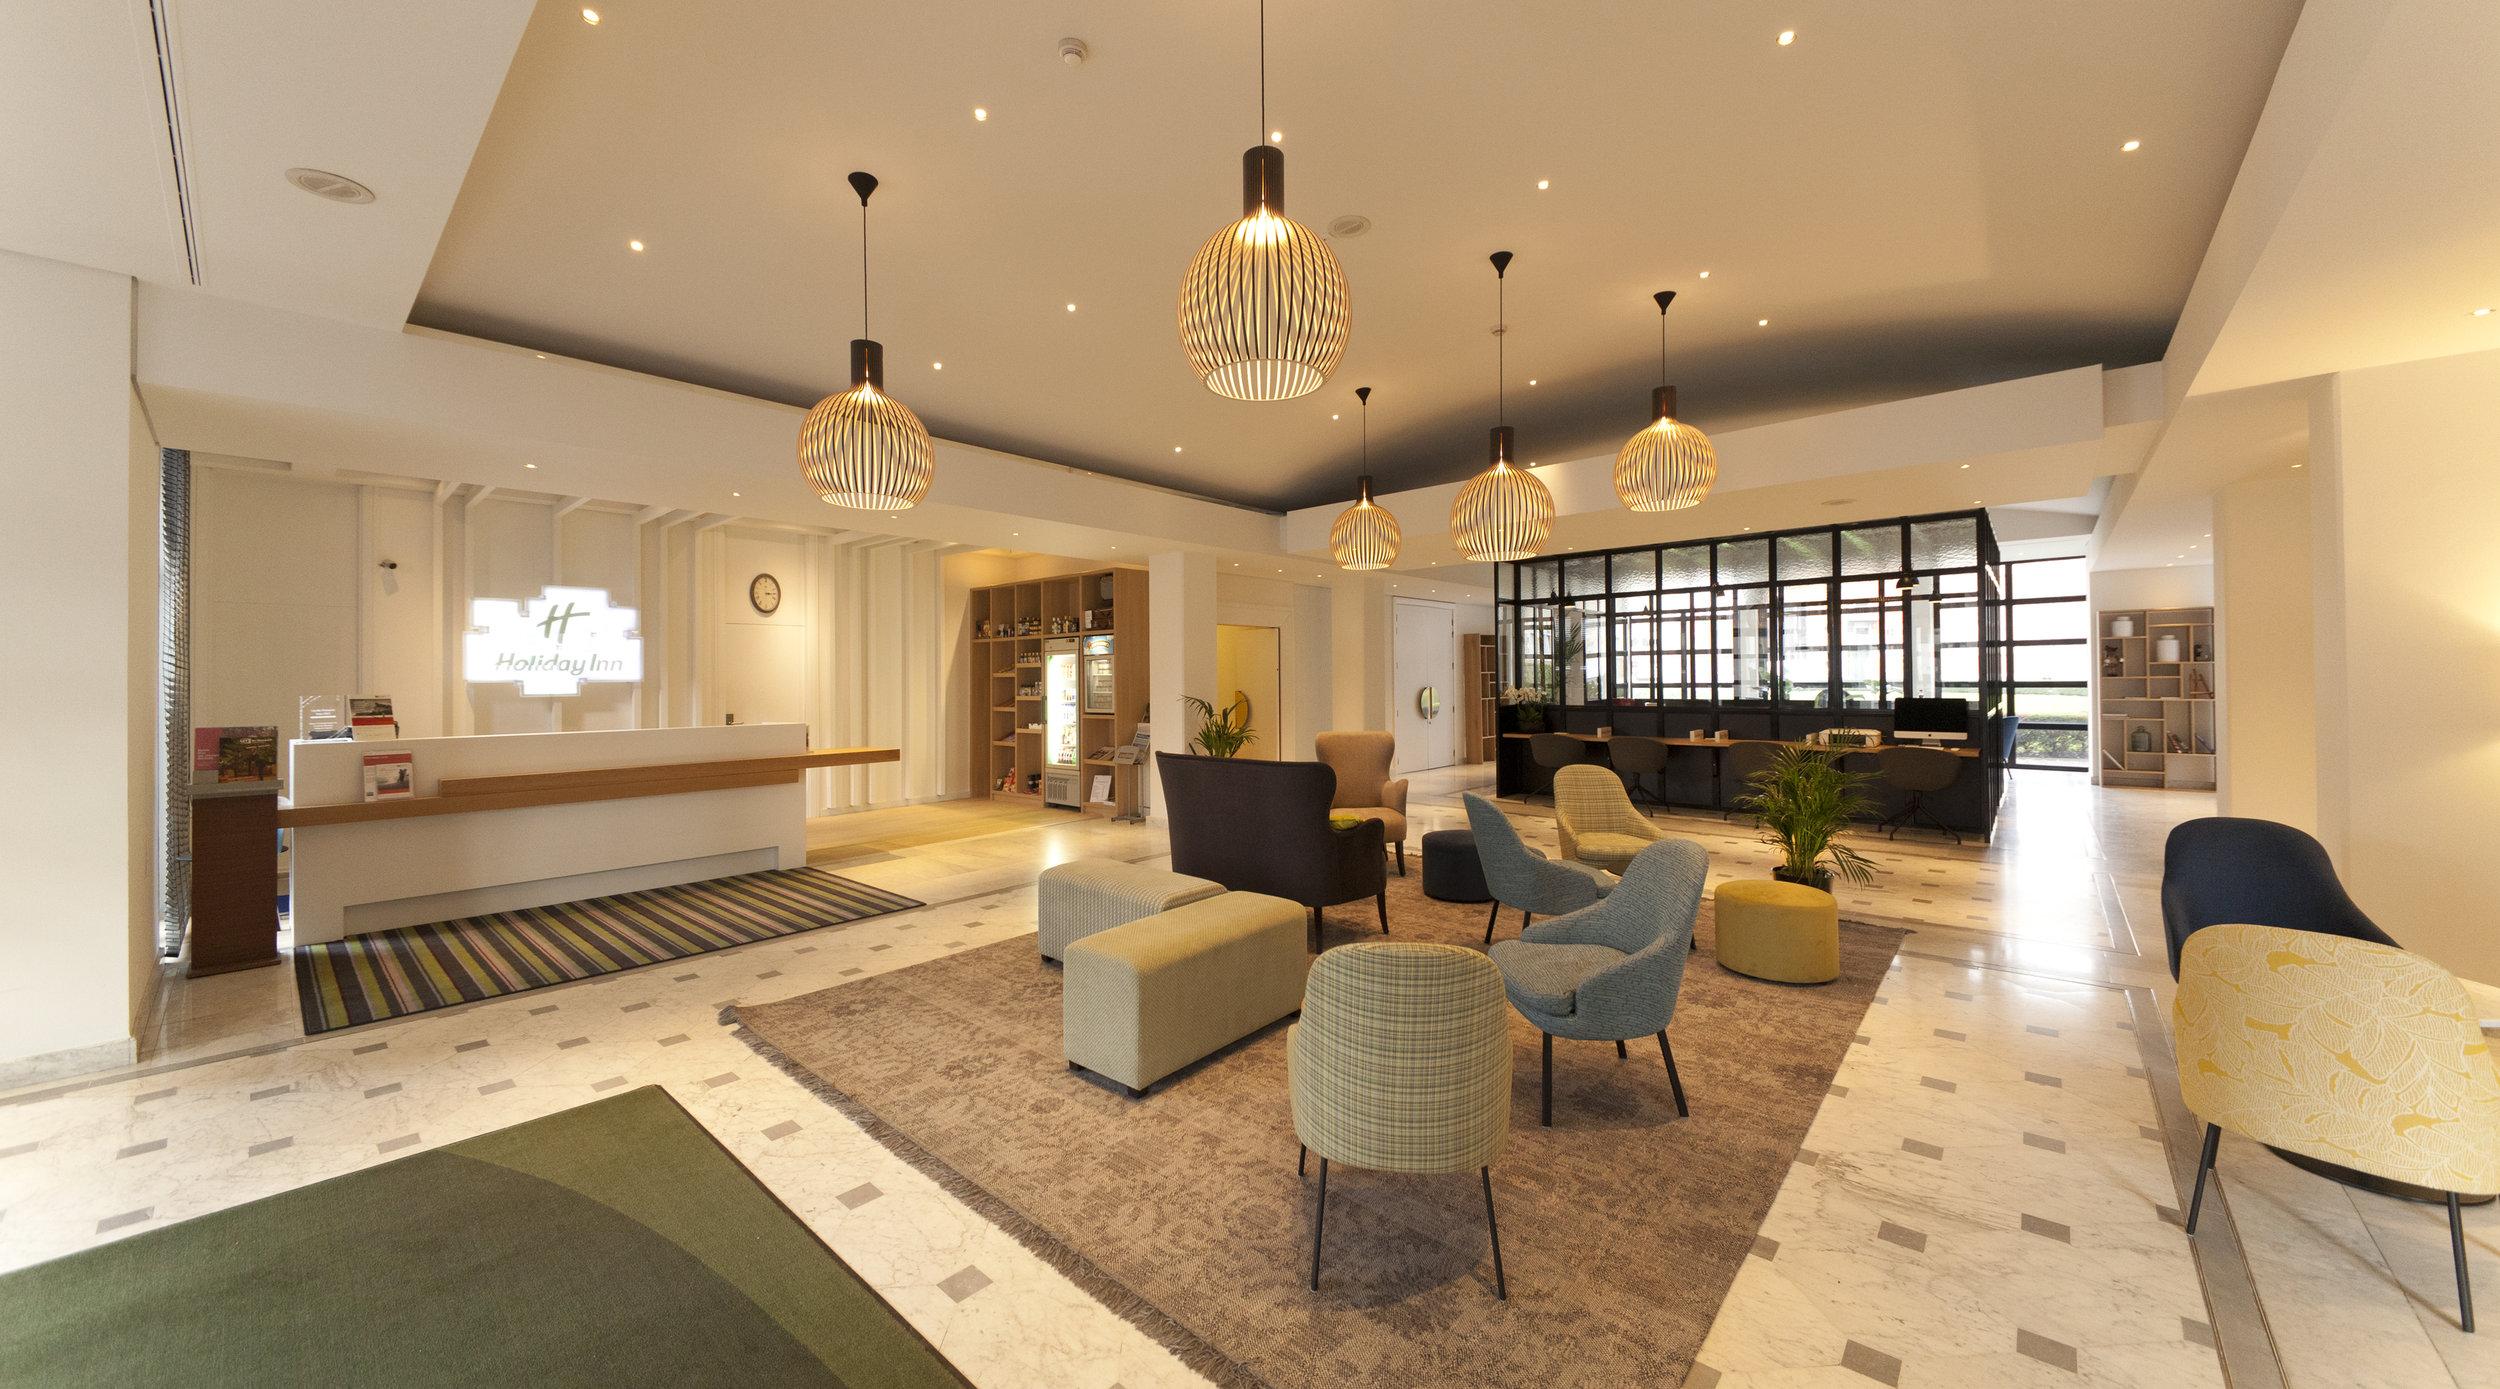 Holiday Inn Hasselt - Management